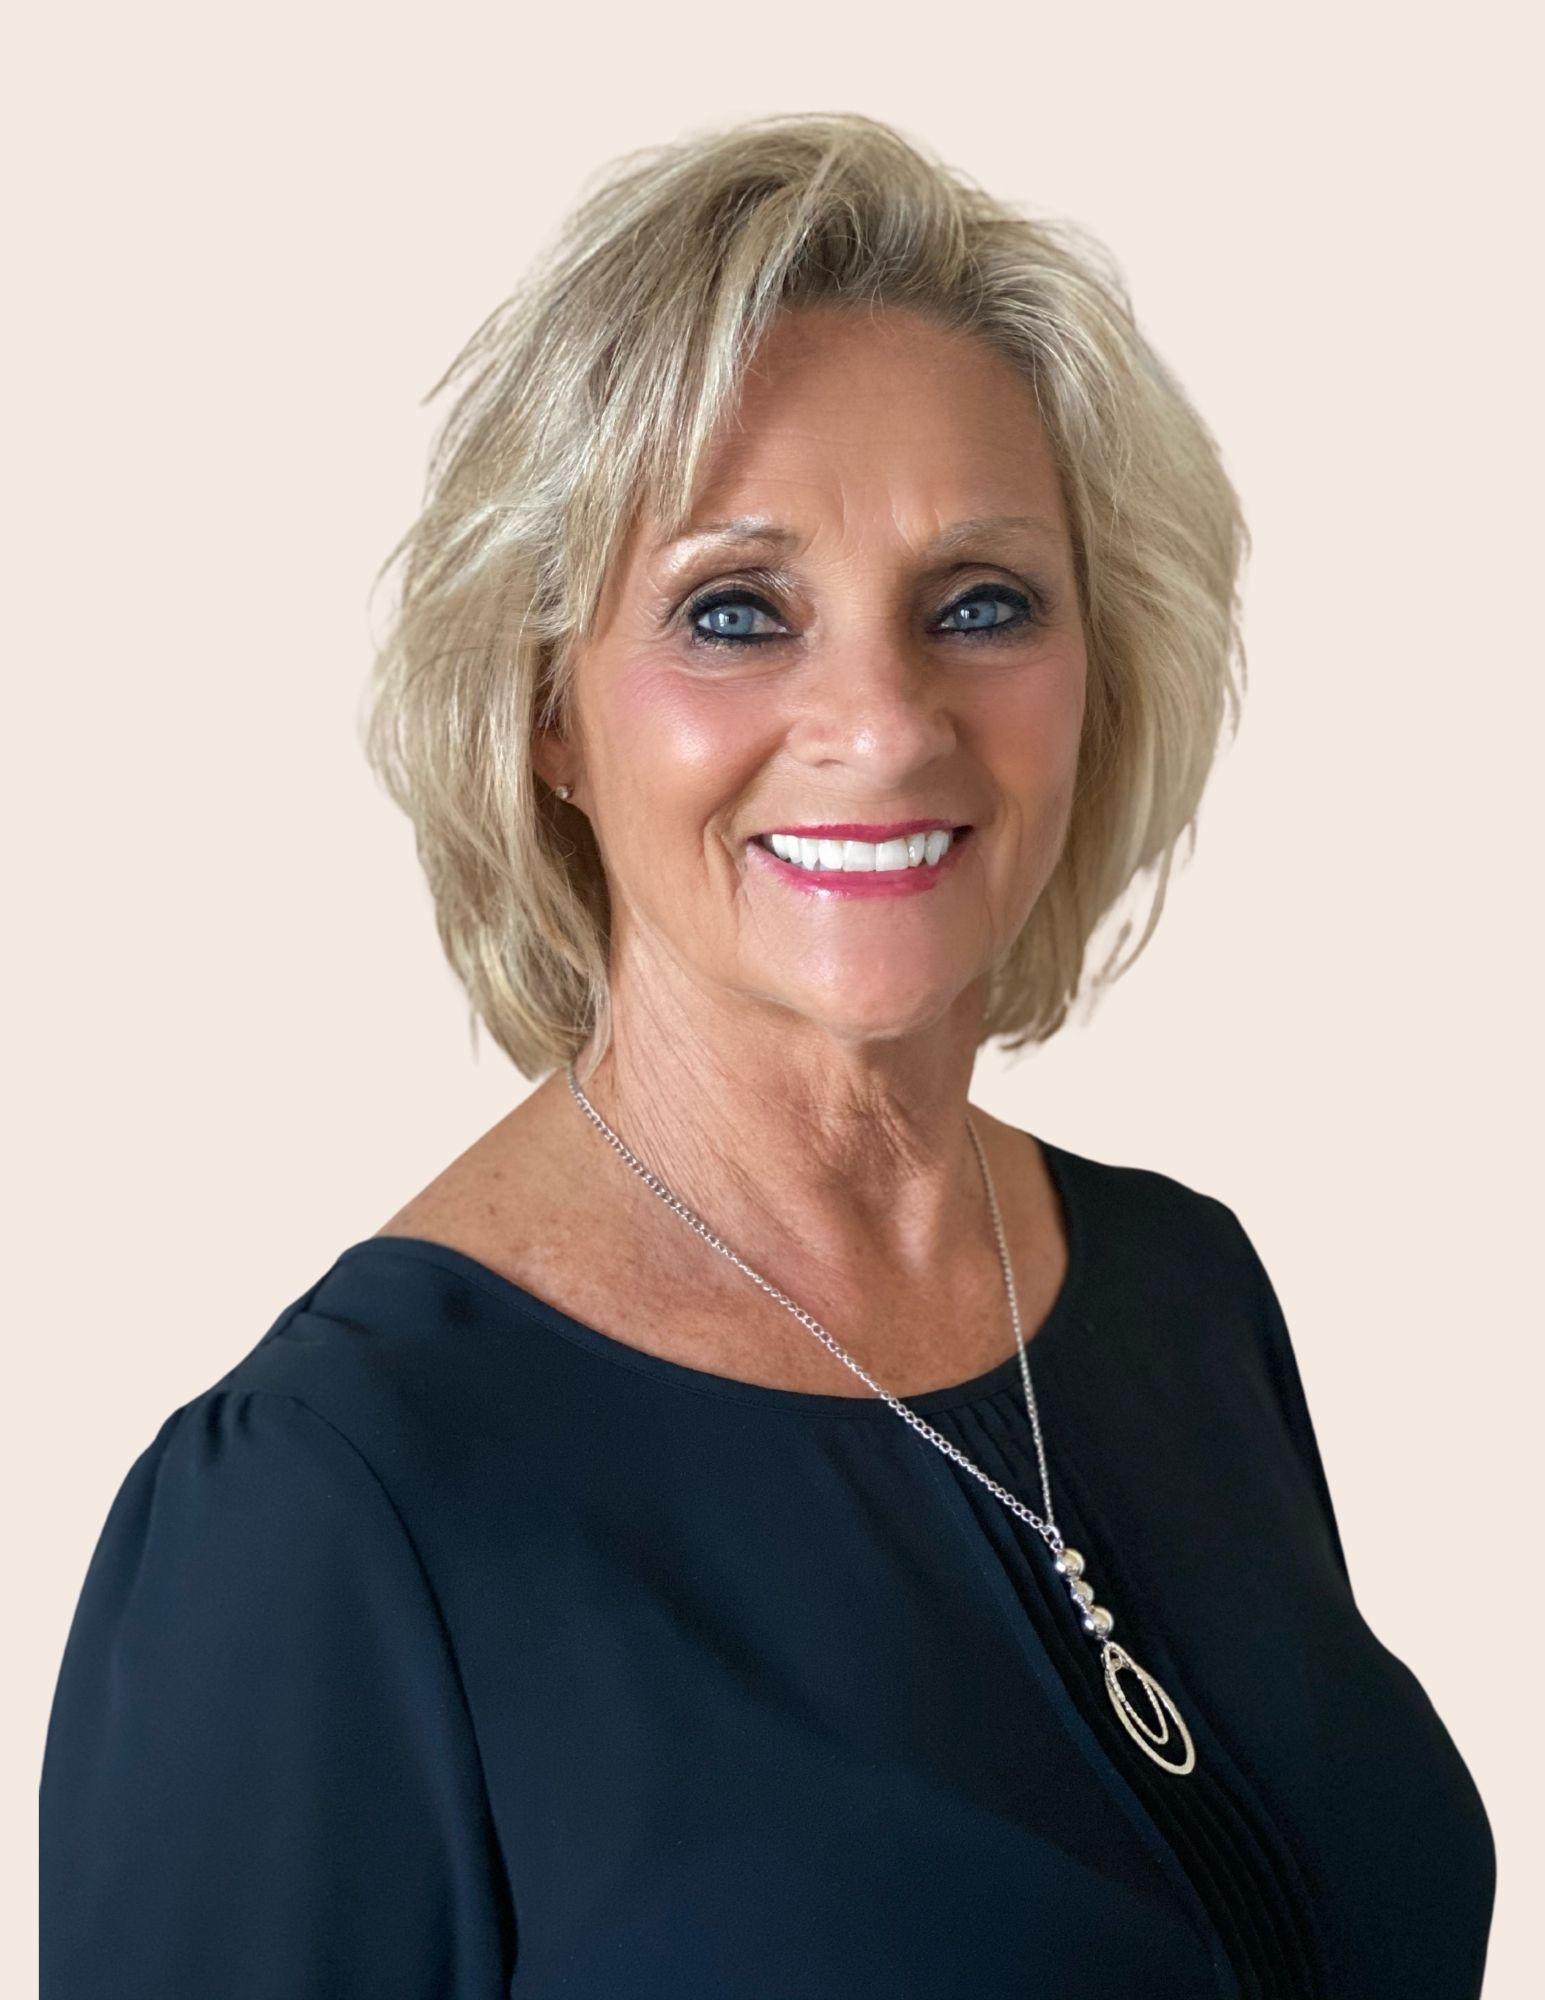 Kristi Sims Pensacola Realtor Gulf Coast Home Experts